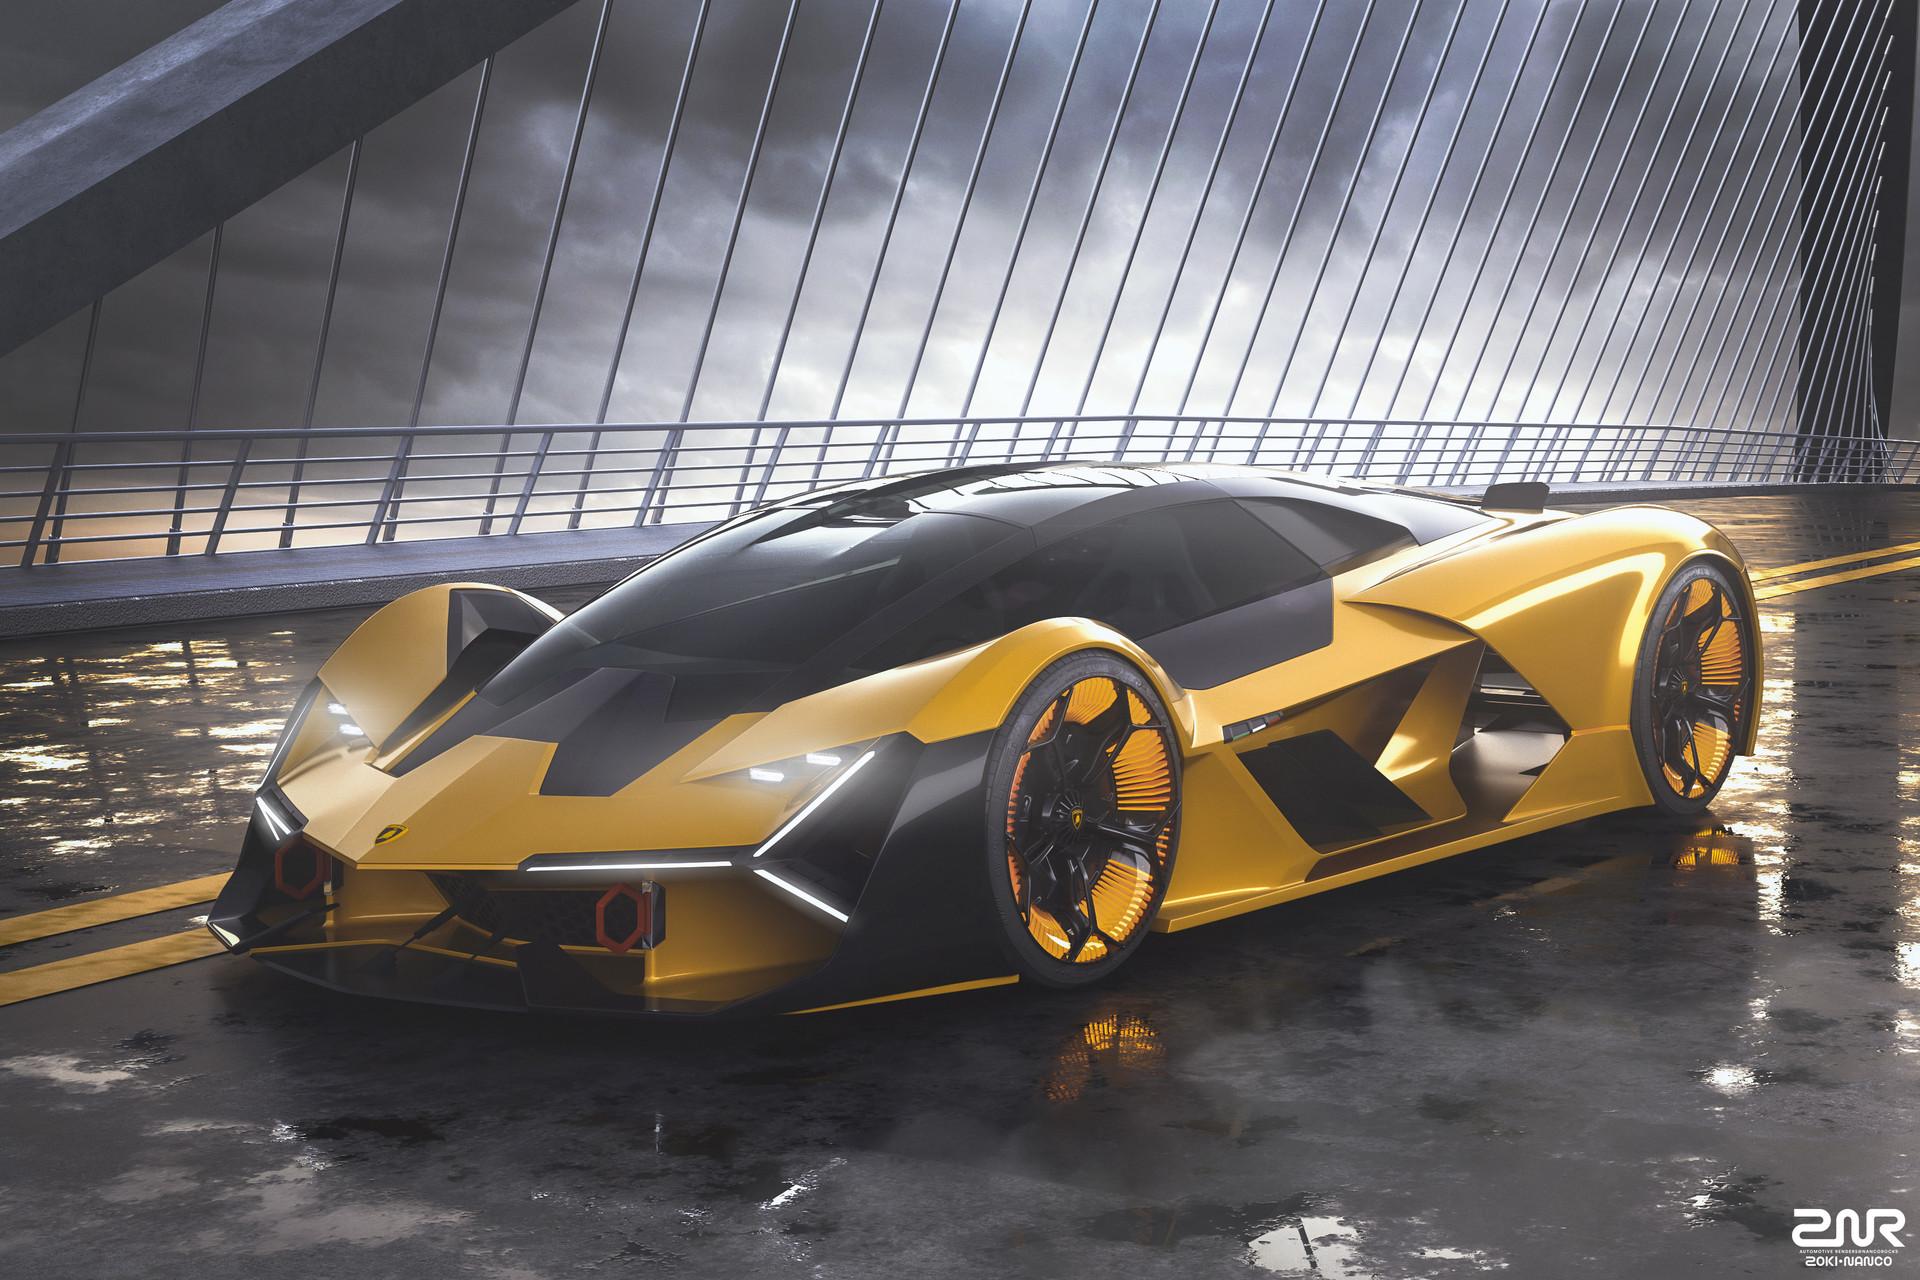 Top Lamborghini Terzo Millennio - zoki-nanco-nancorocks-1-1  You Should Have_151388.jpg?1513383174